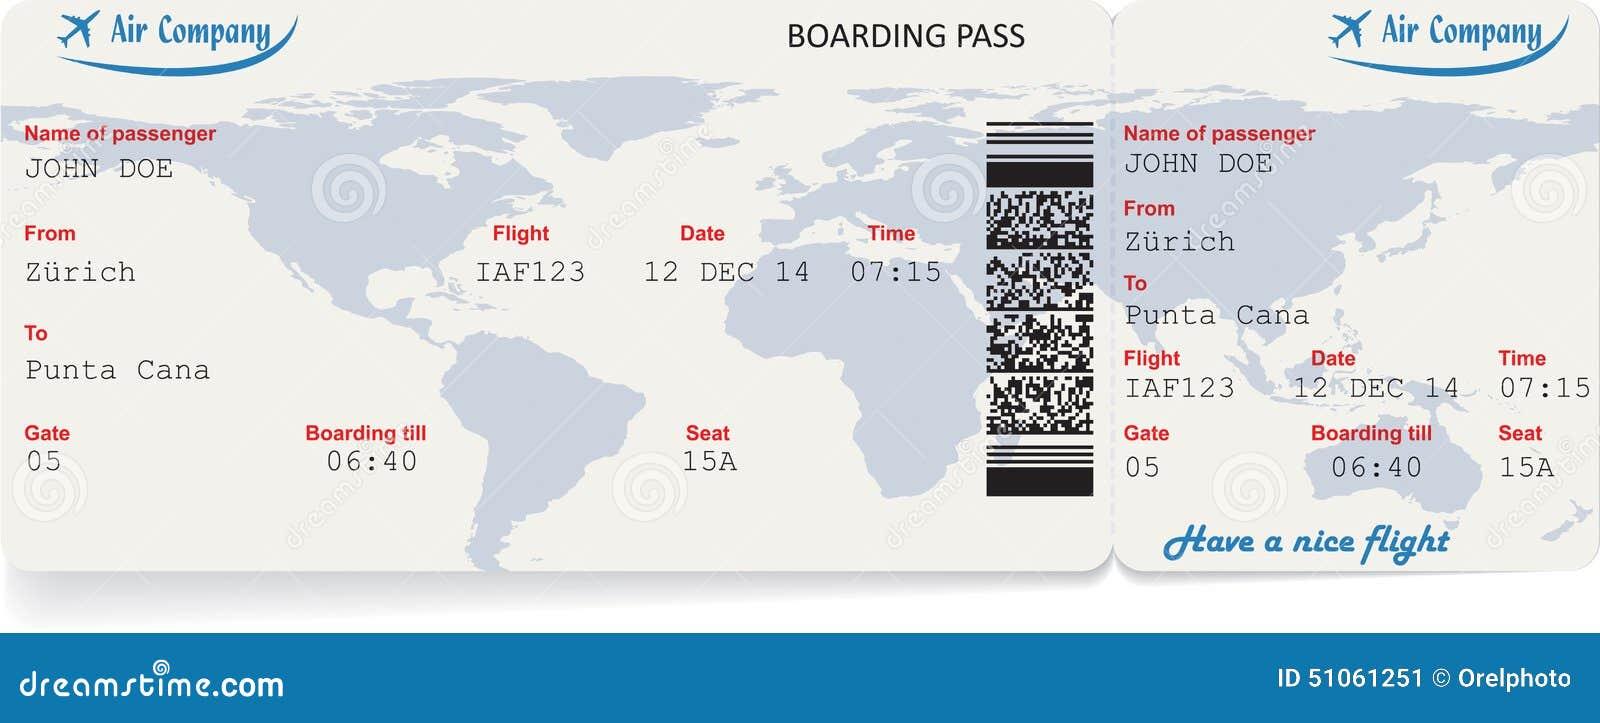 Make my trip coupon code 2018 for international flights